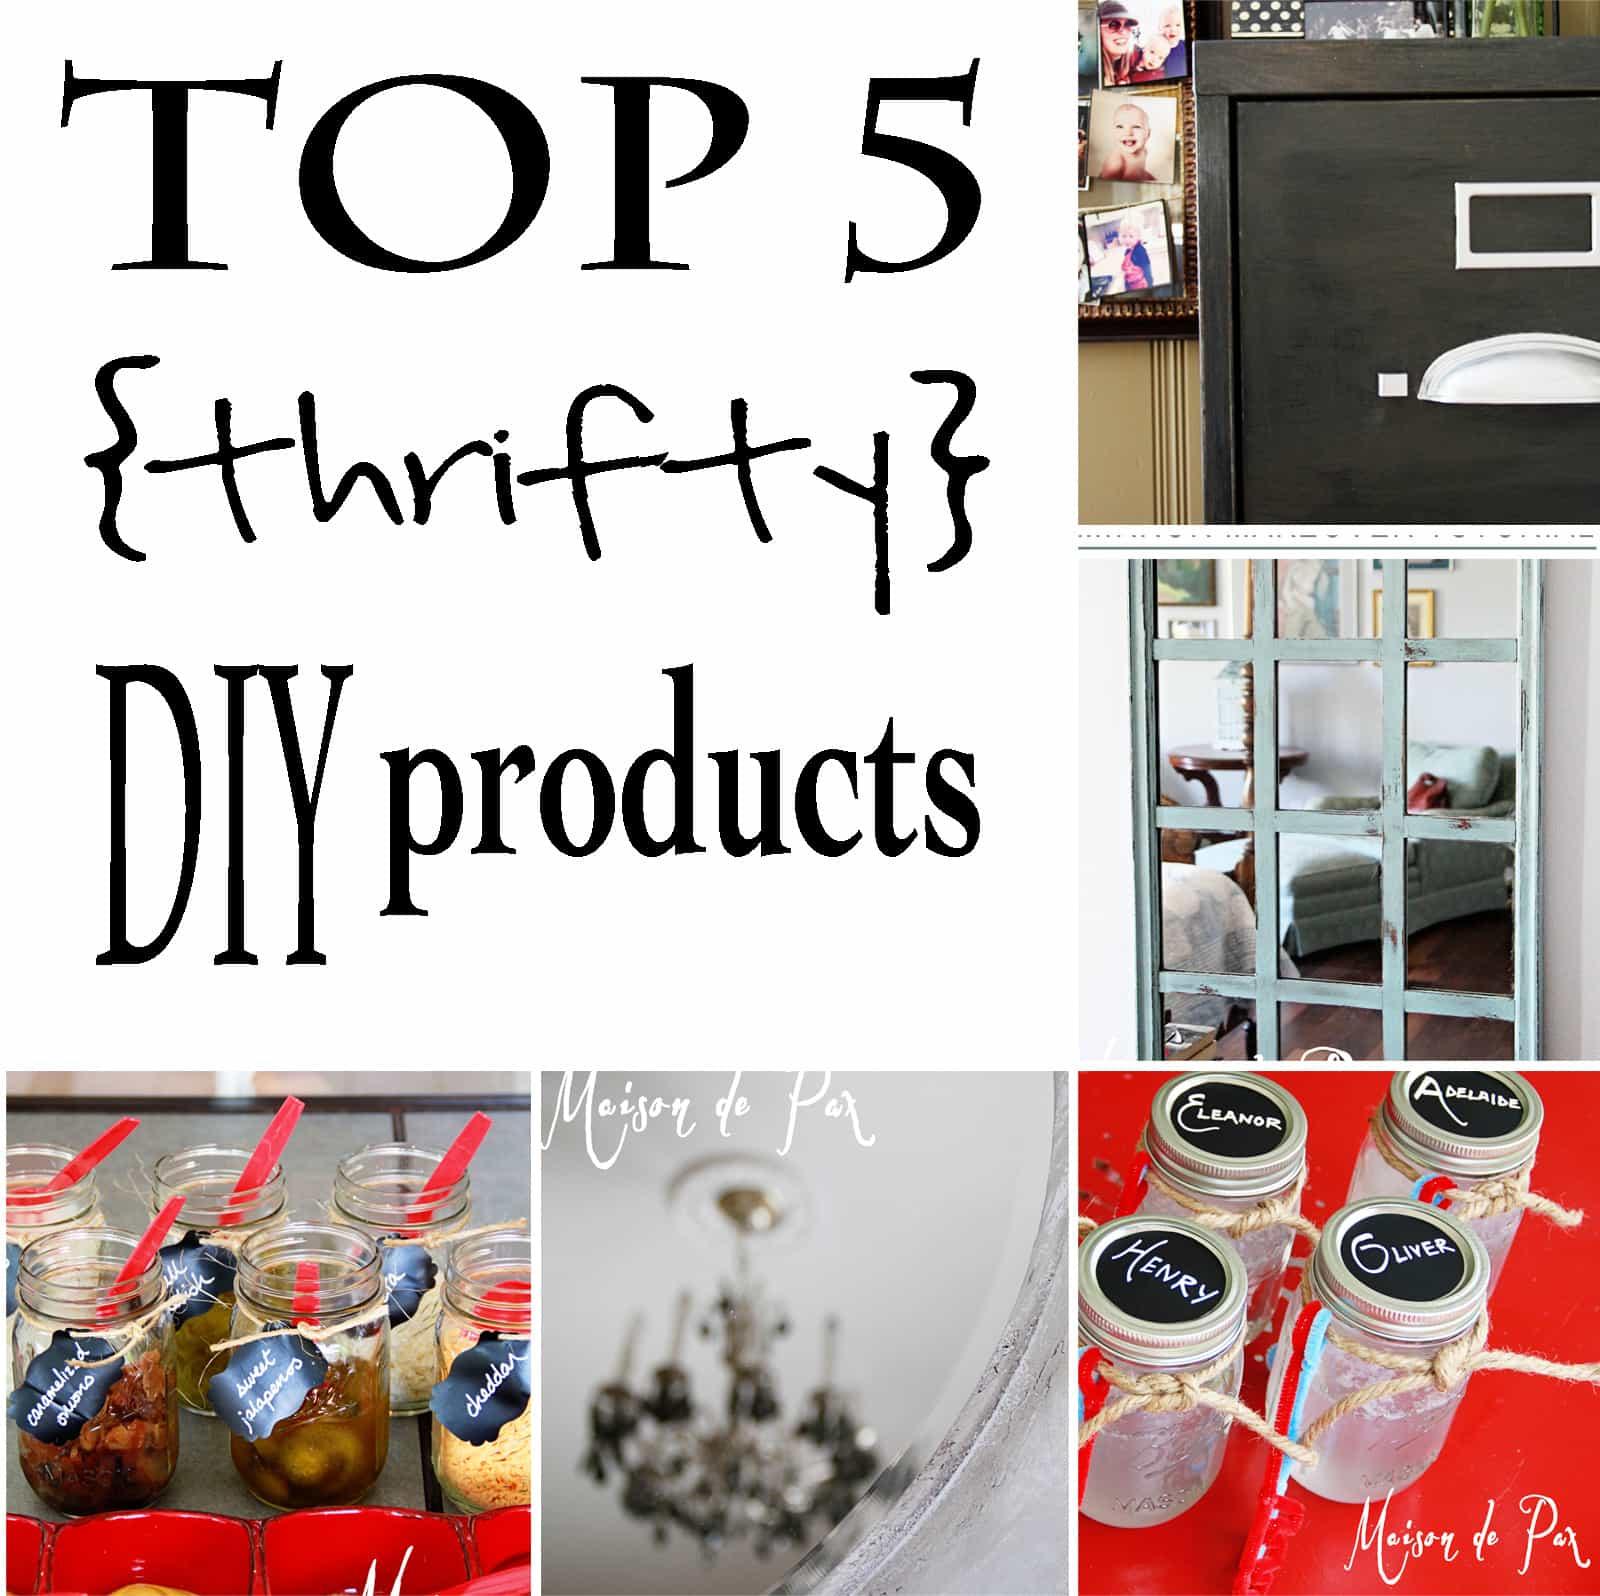 top 5 diy products